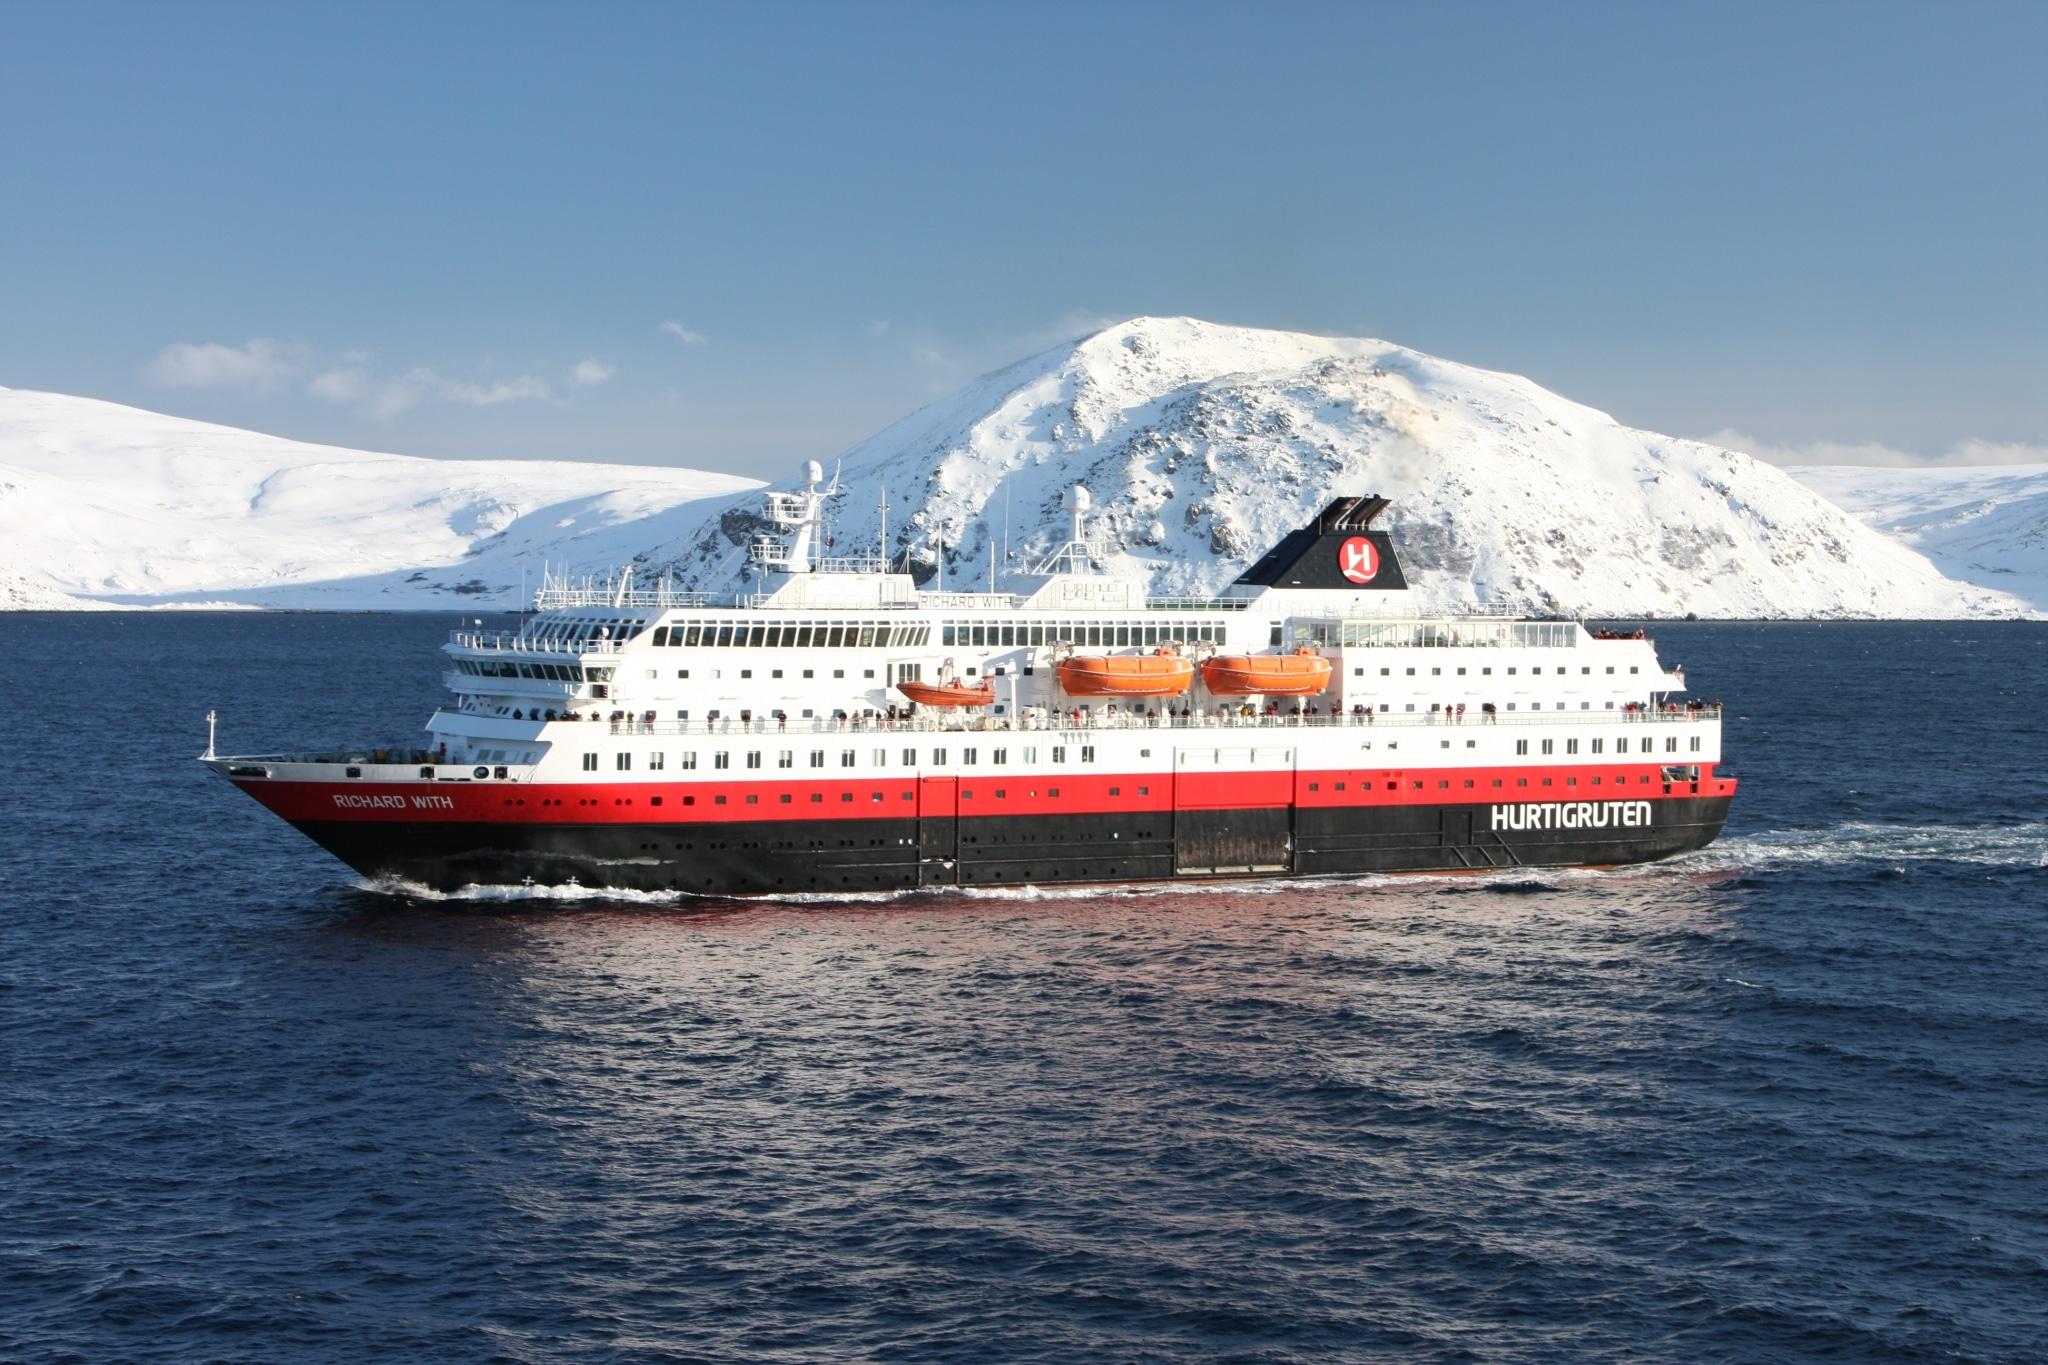 MS Richard With (c) Hurtigruten